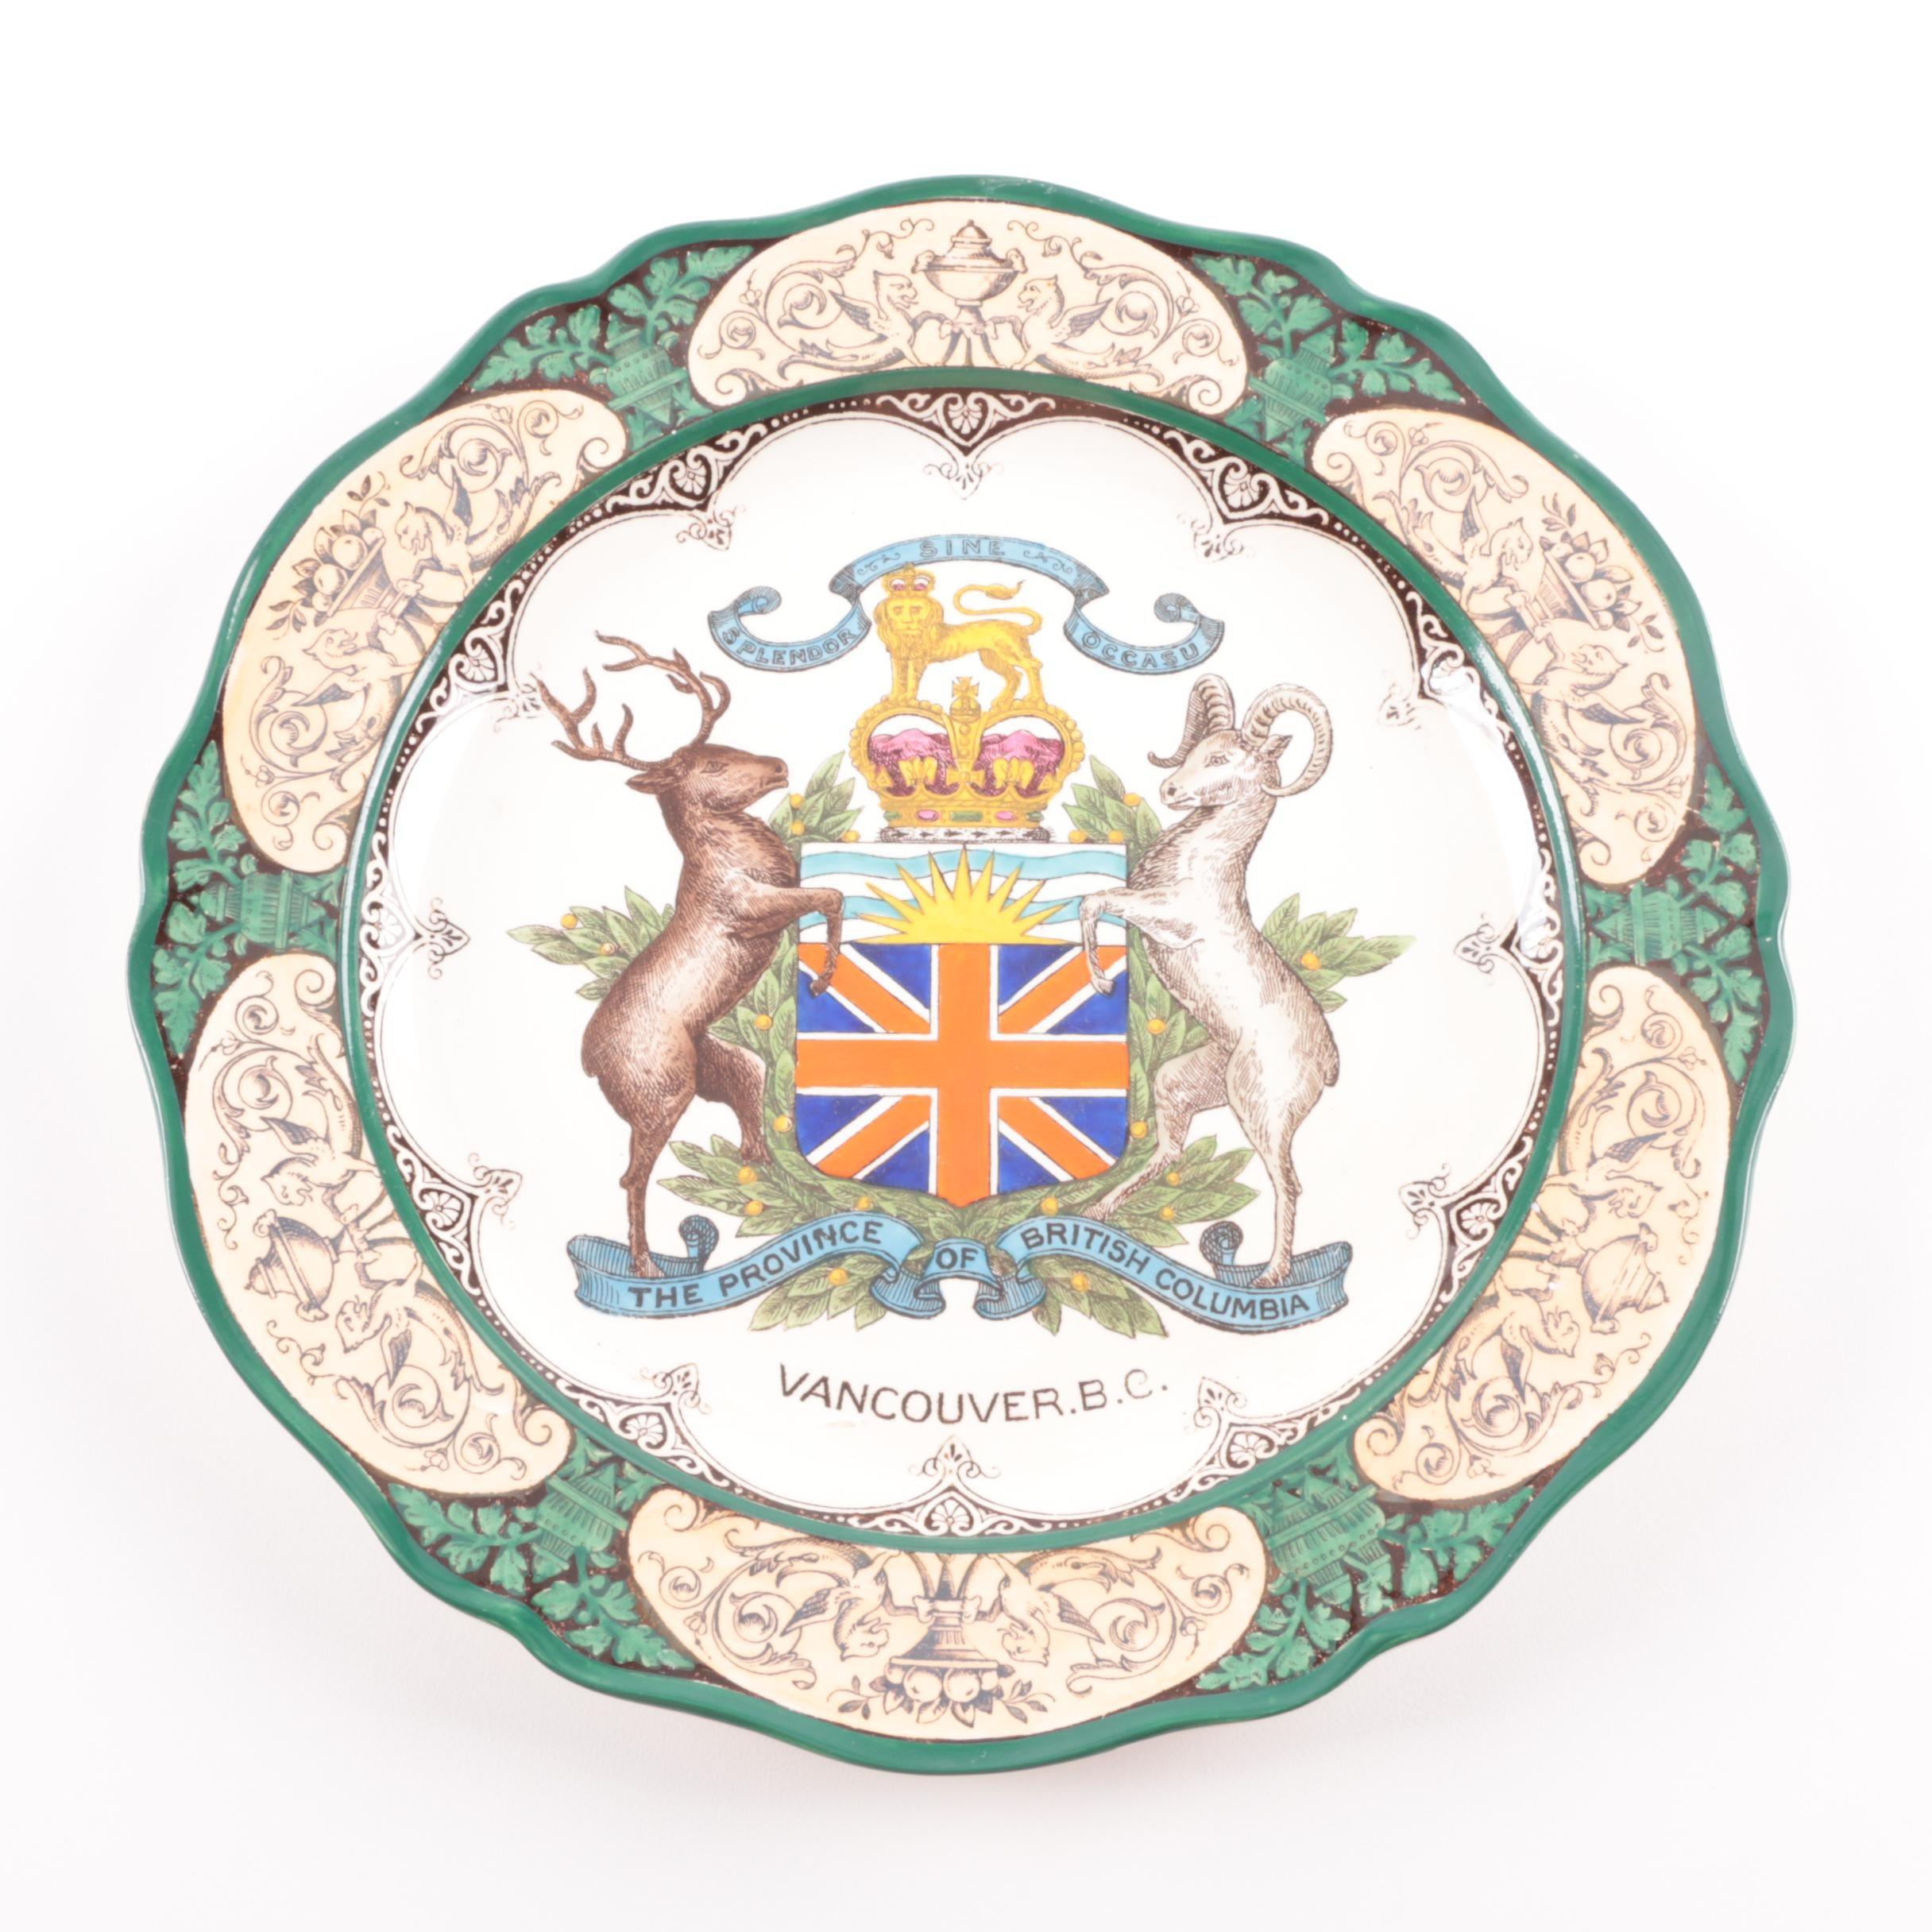 Vintage Vancouver Commemorative Porcelain Plate by Wedgwood